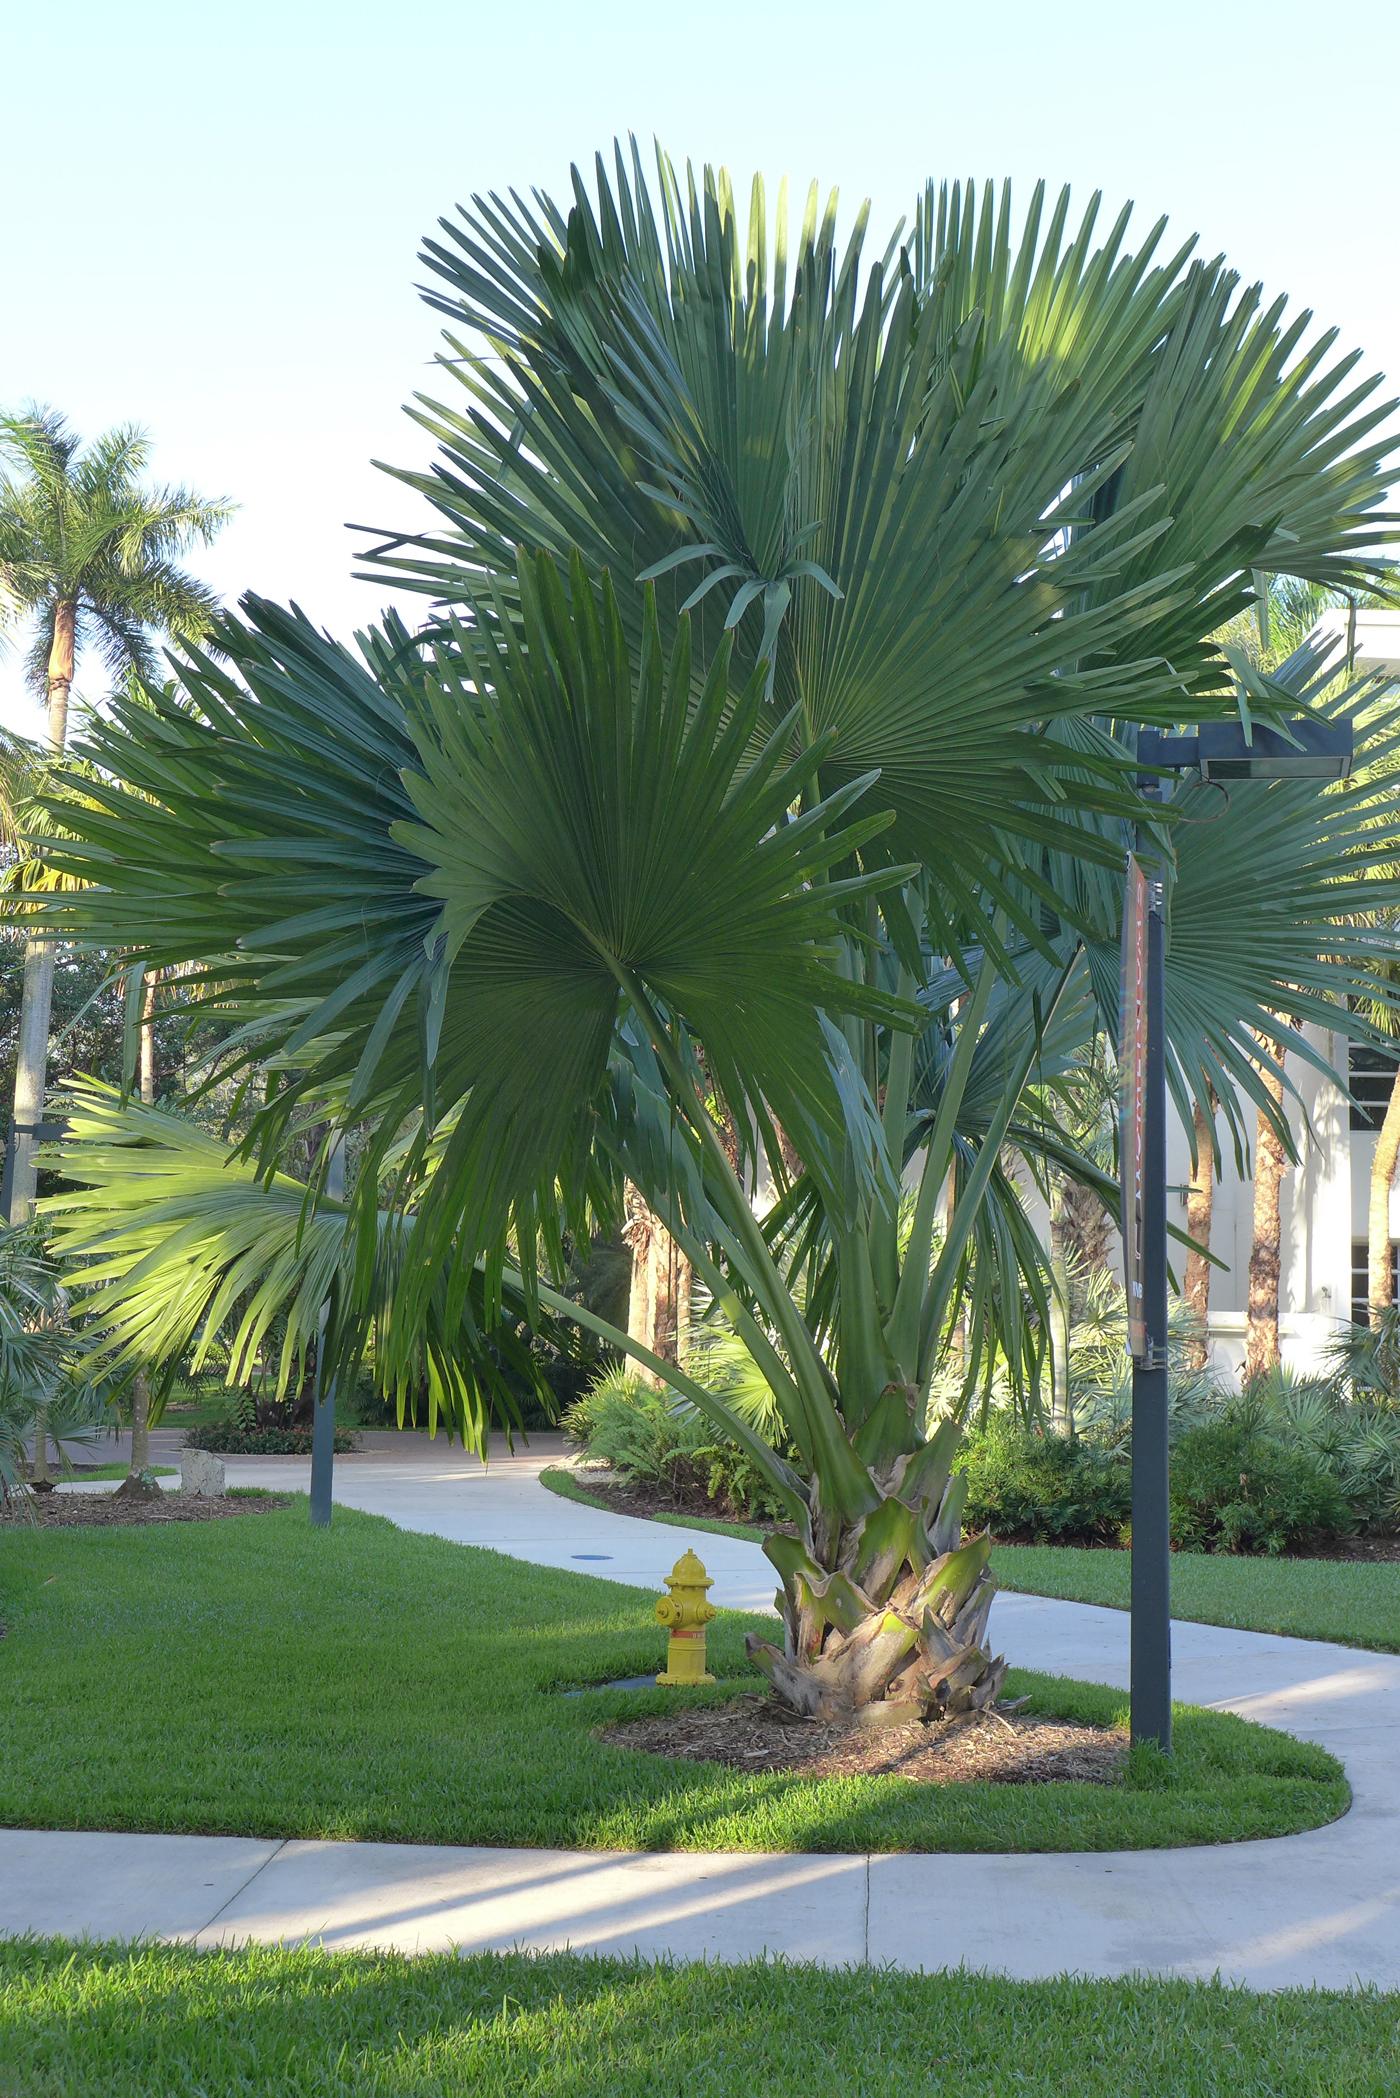 UM Palmetum Corypha umbraculifera